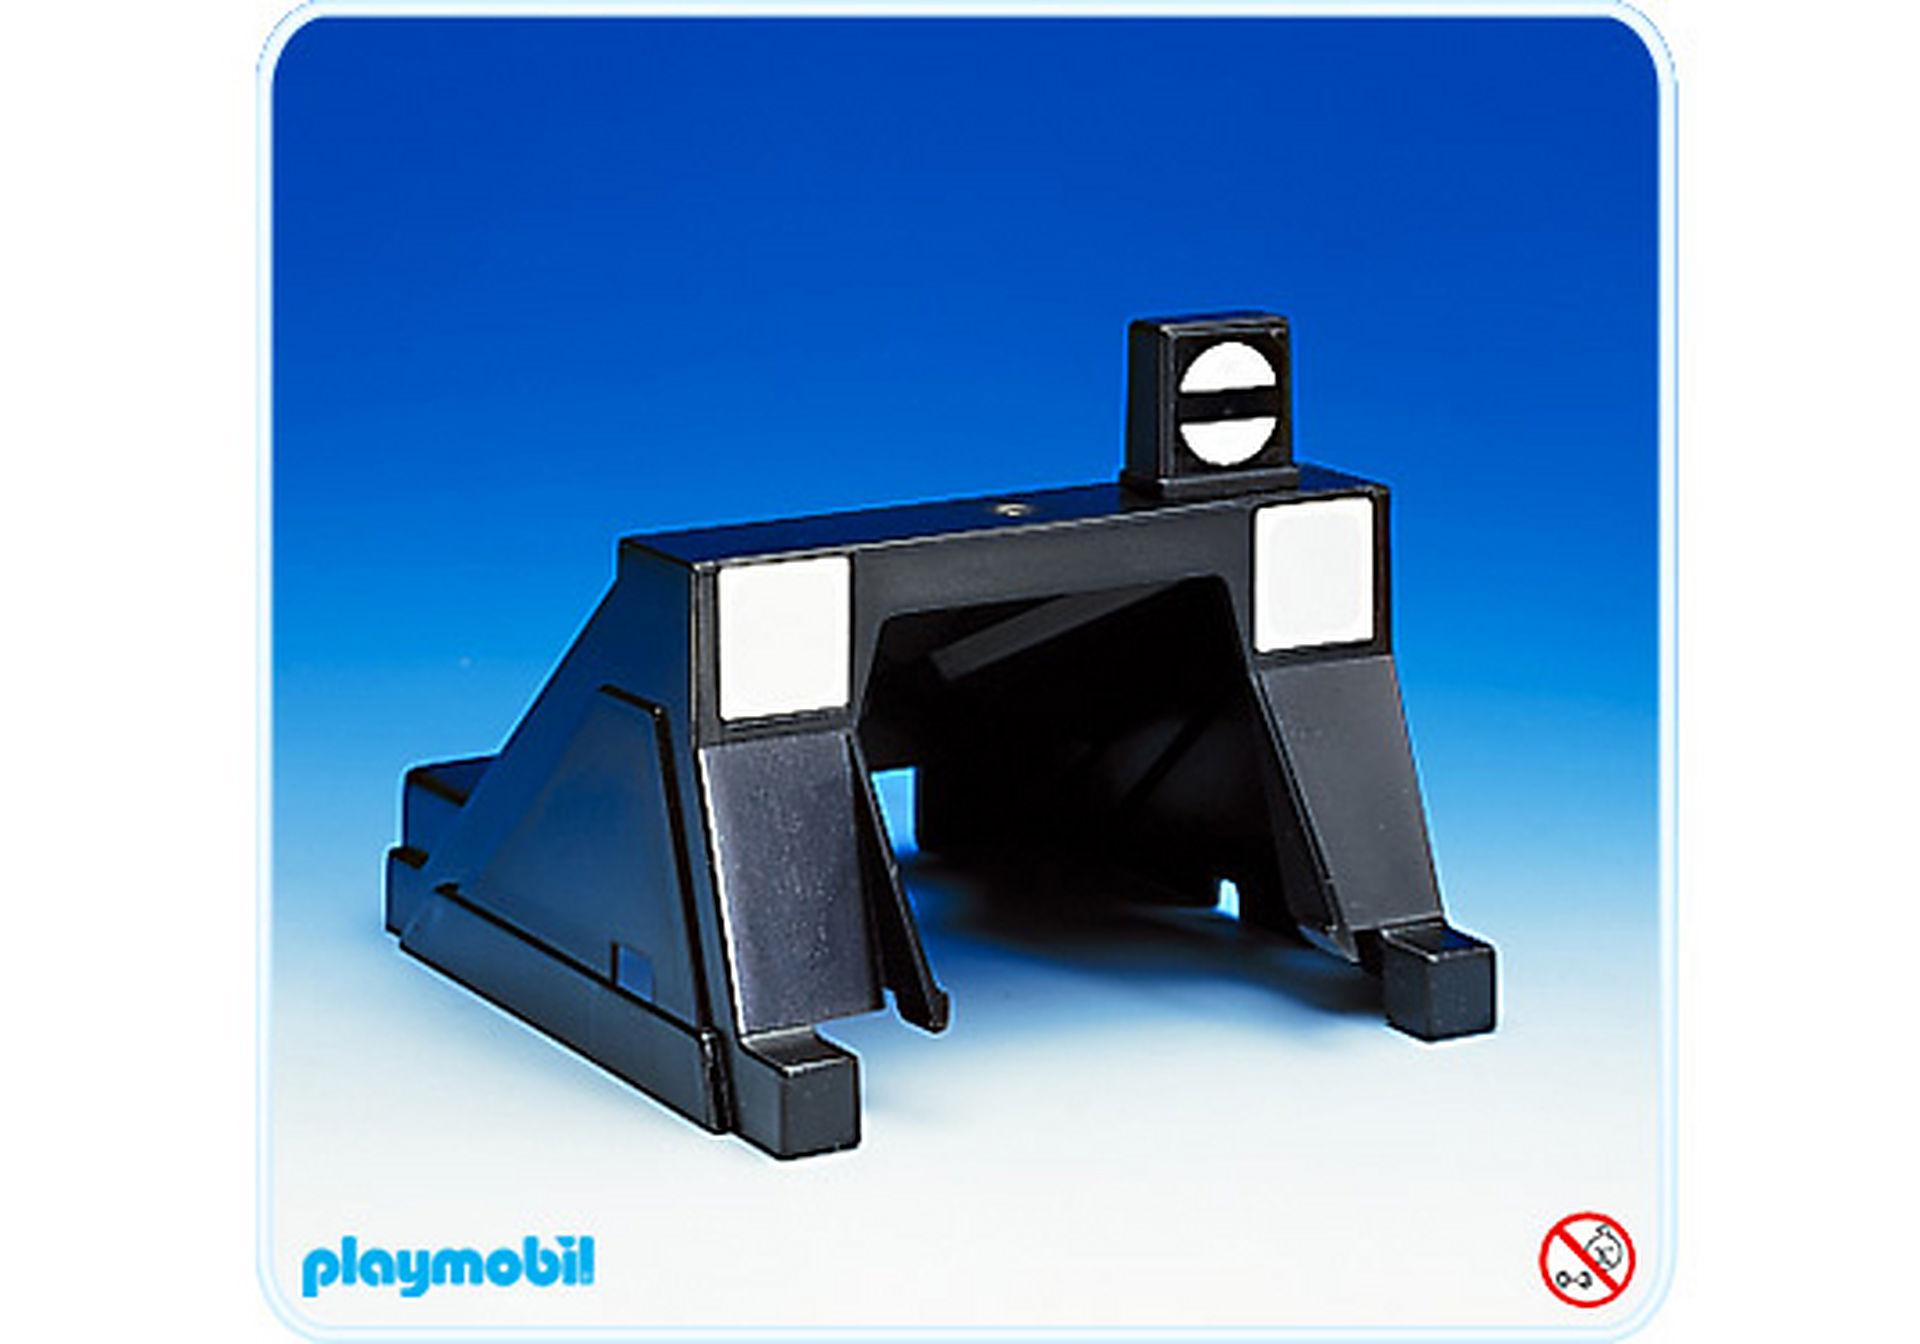 http://media.playmobil.com/i/playmobil/4352-A_product_detail/Heurtoir